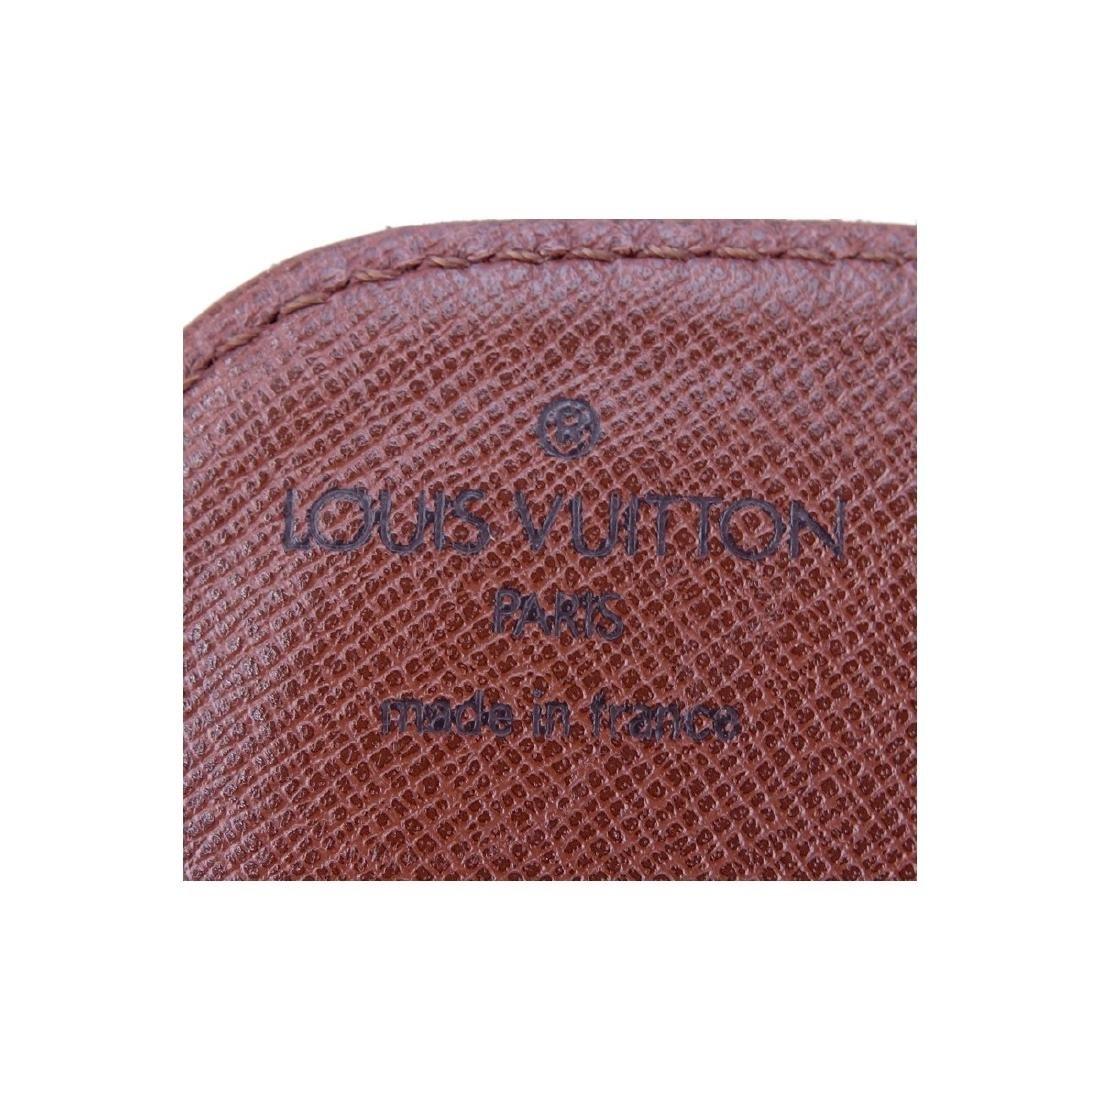 Louis Vuitton Brown Monogram Coated Canvas - 5